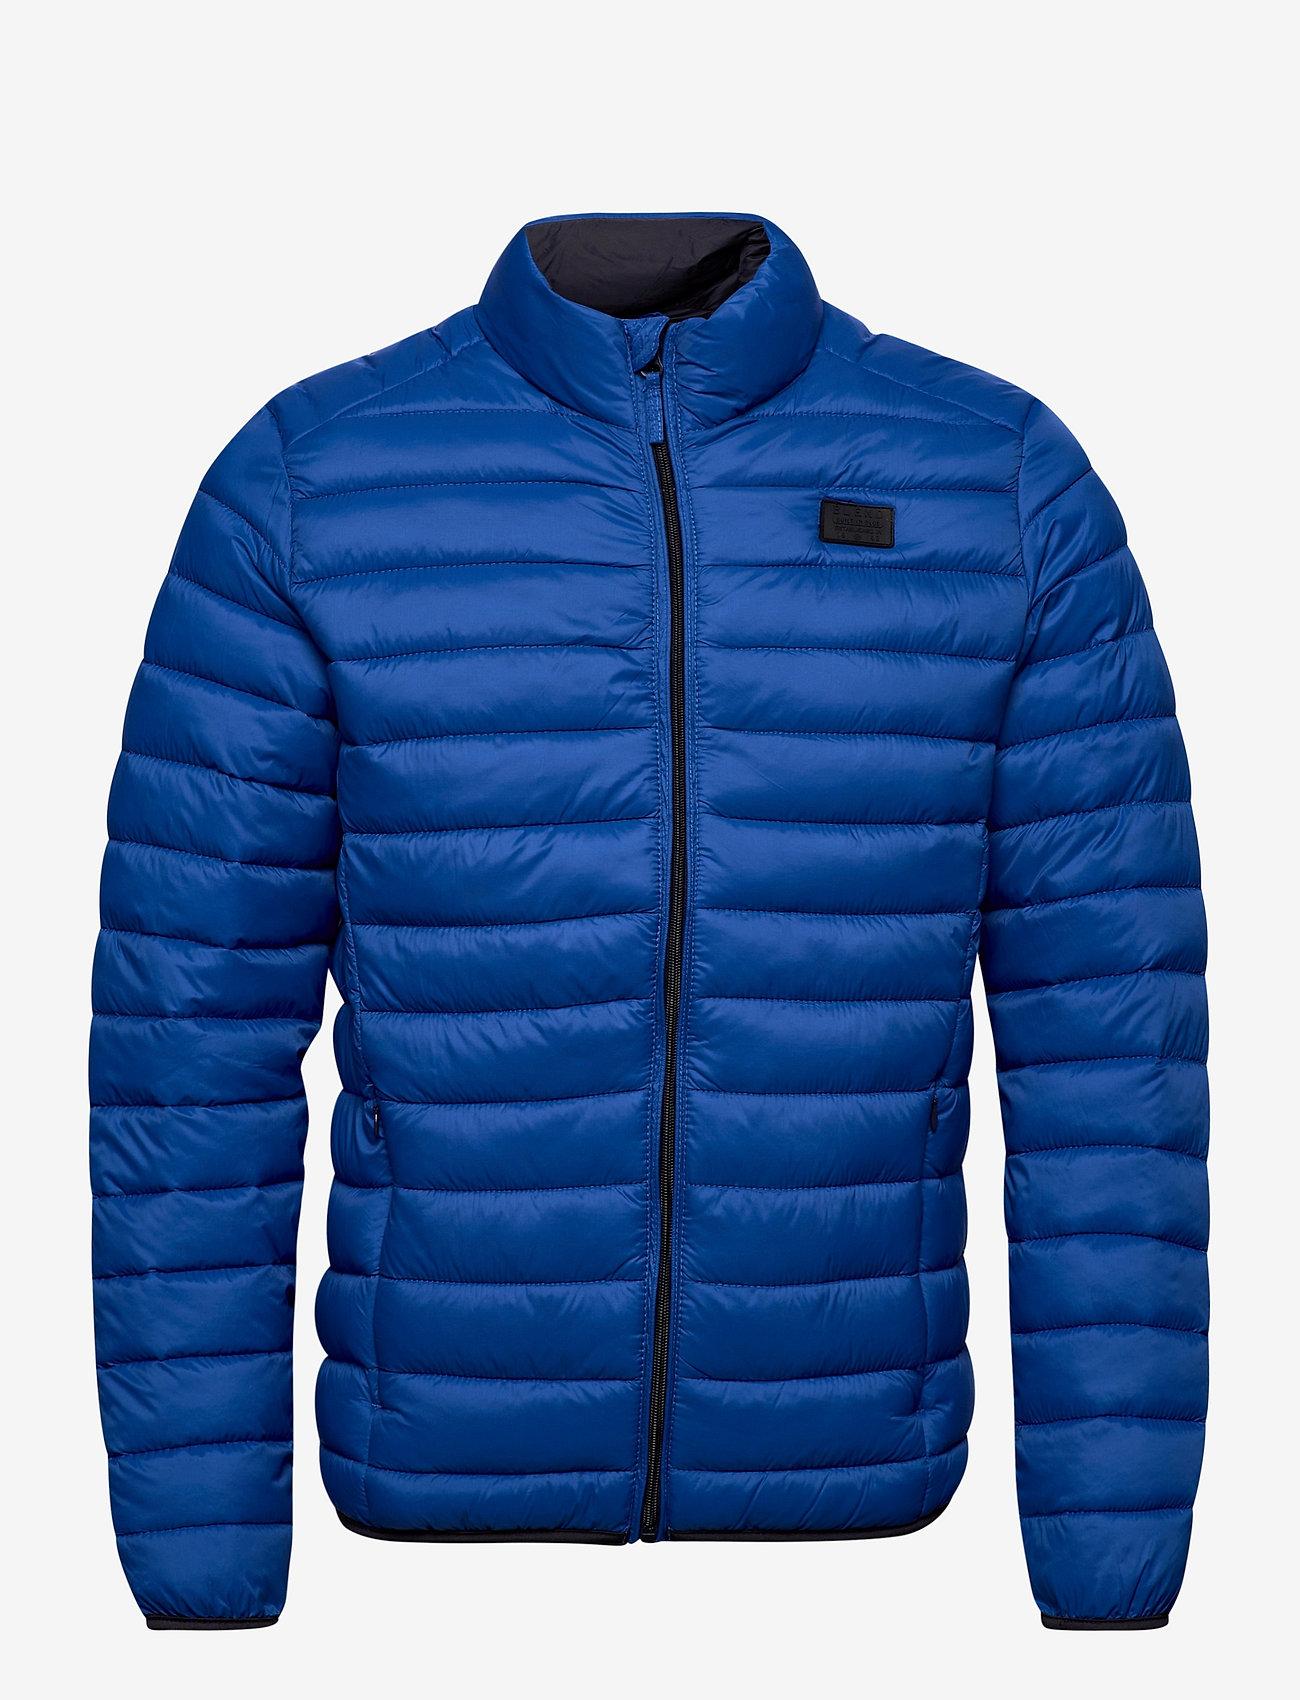 Blend - Outerwear - donsjassen - blue lolite - 1